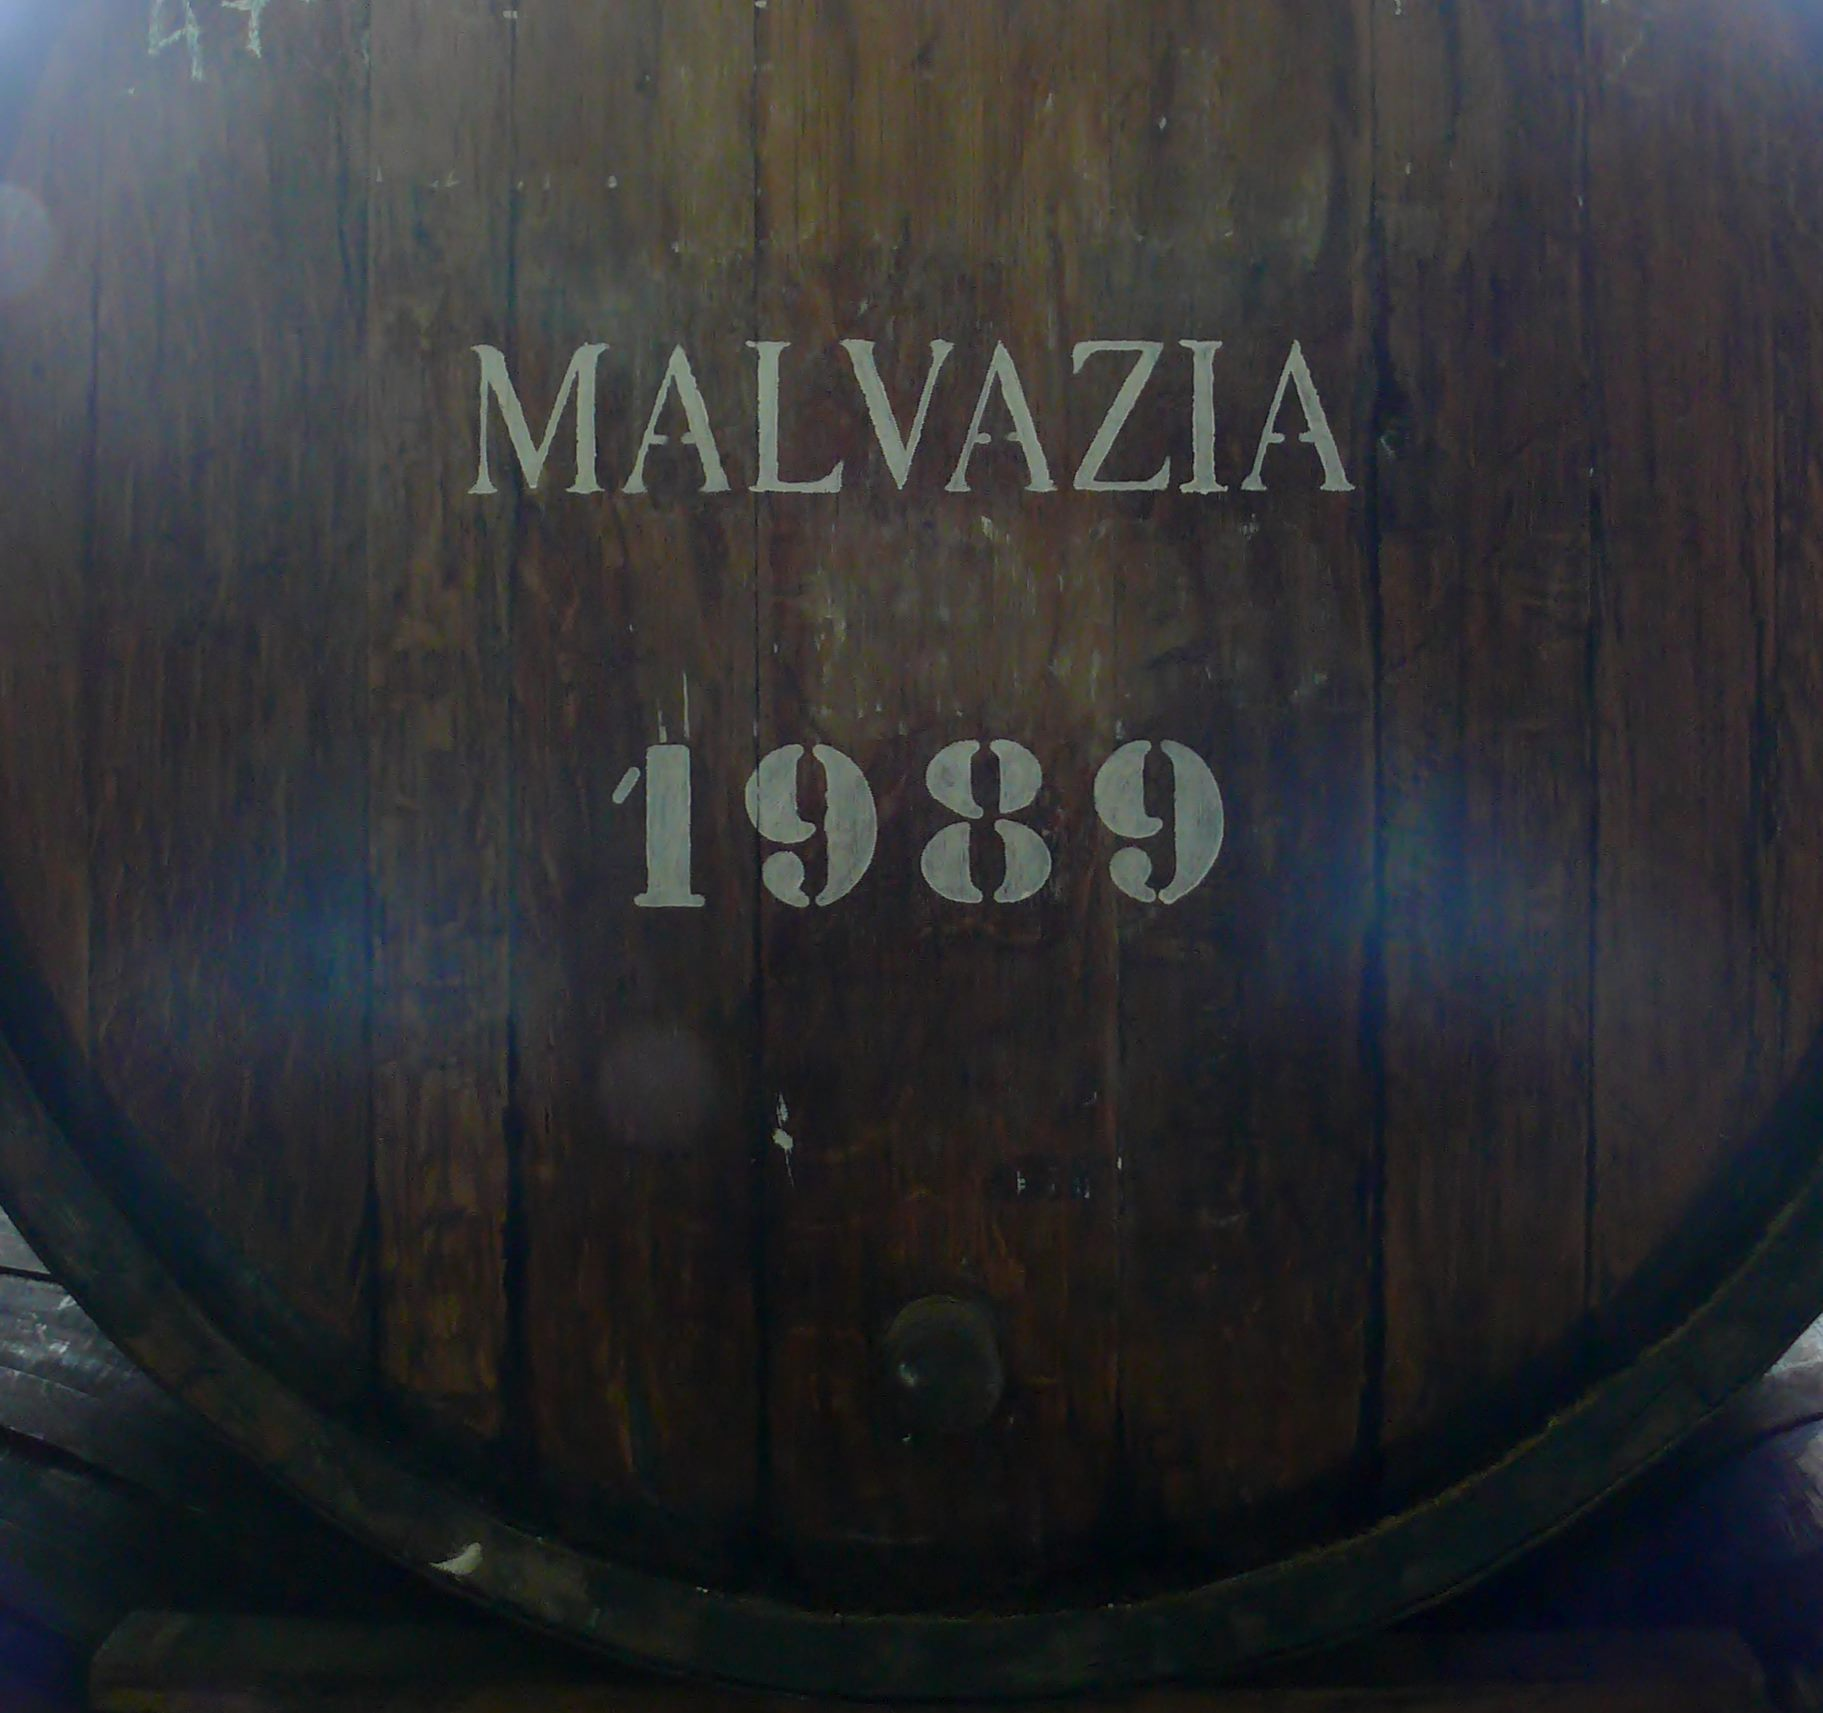 Malvazia 1989